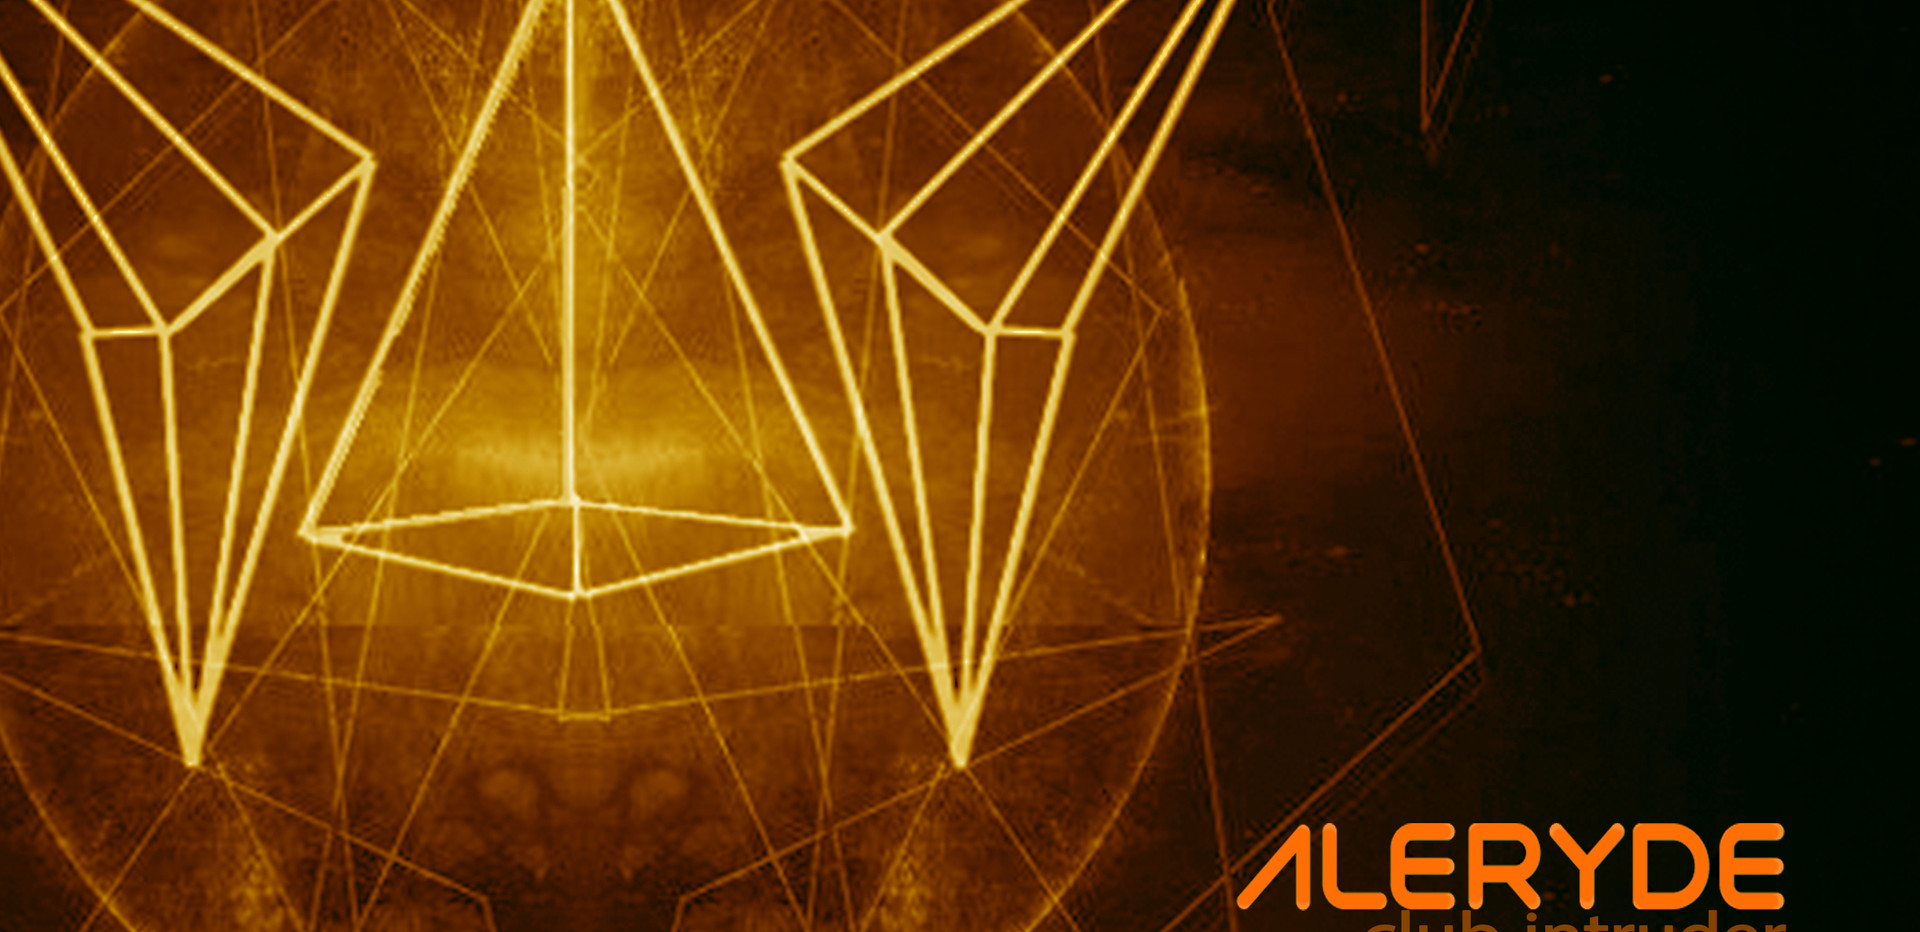 Aleryde_ Club Intruder rmx's